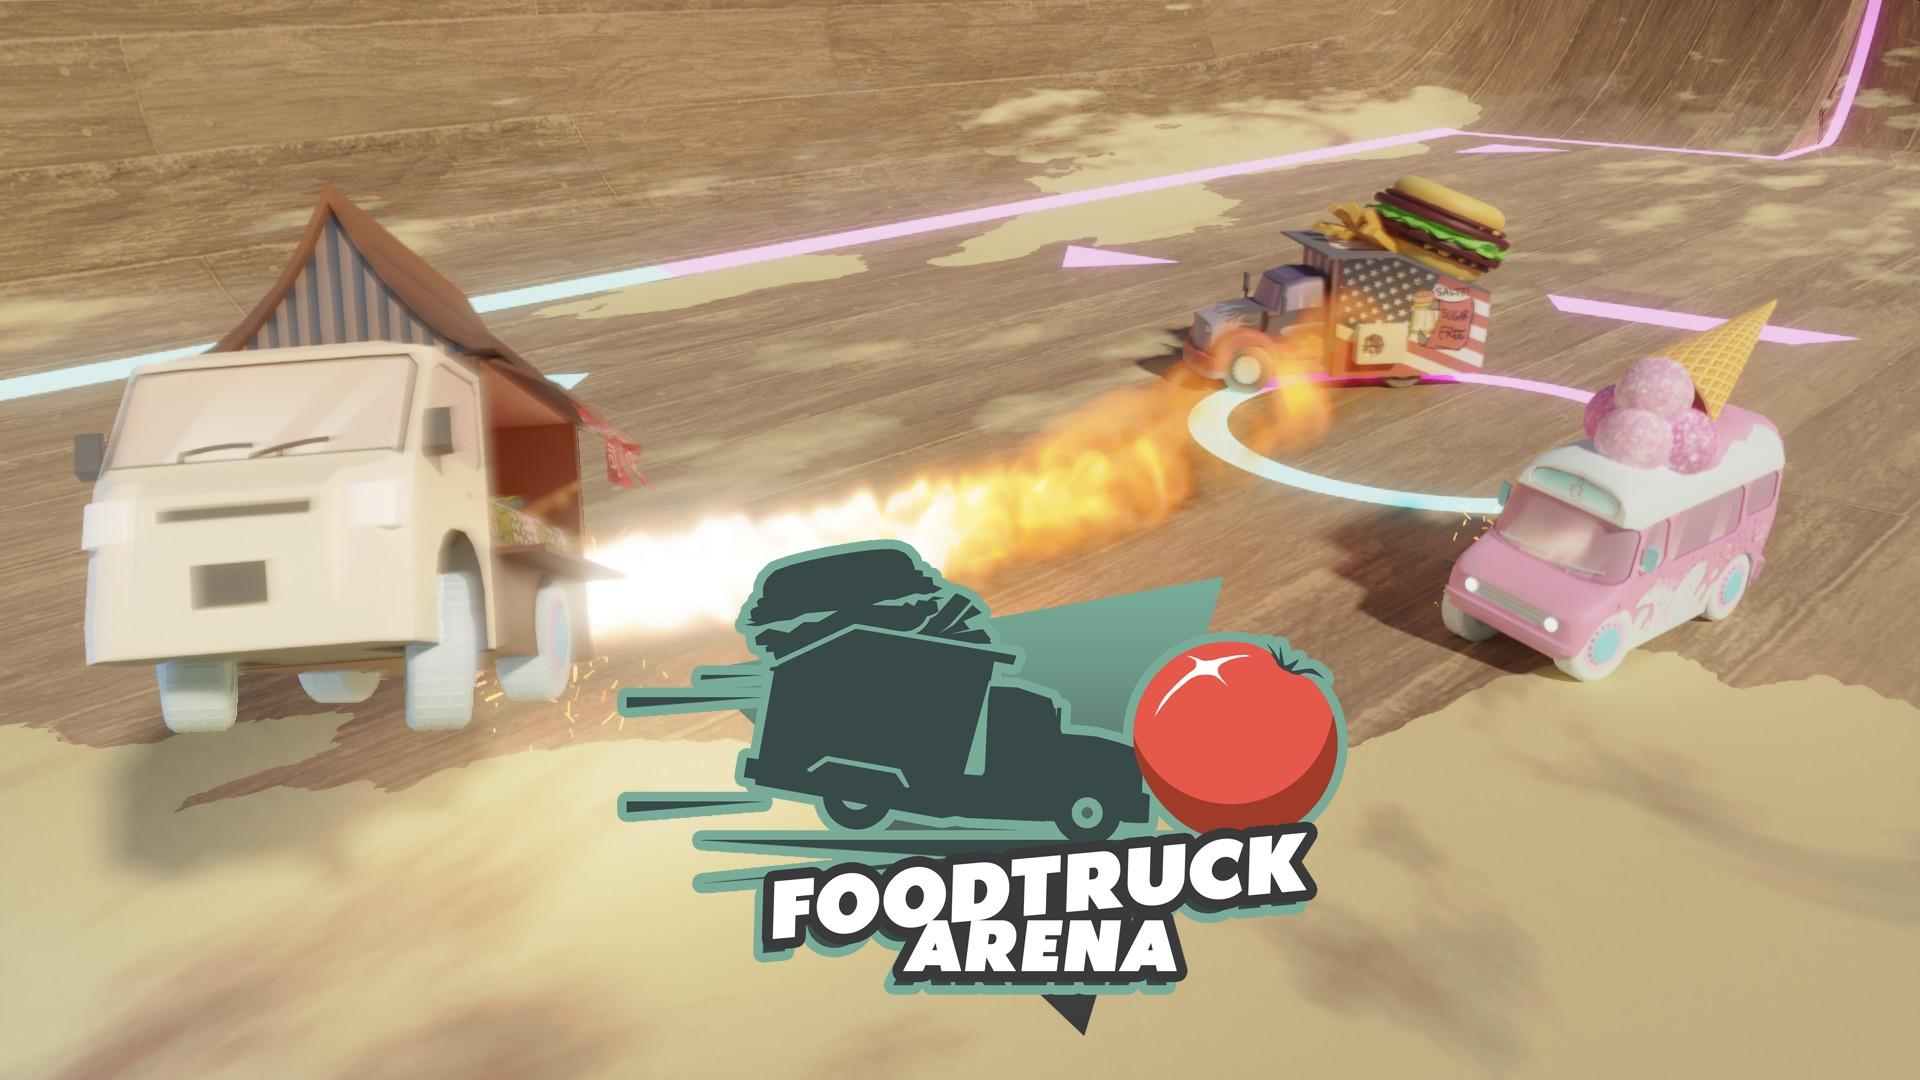 Foodtruck Arena Free Download